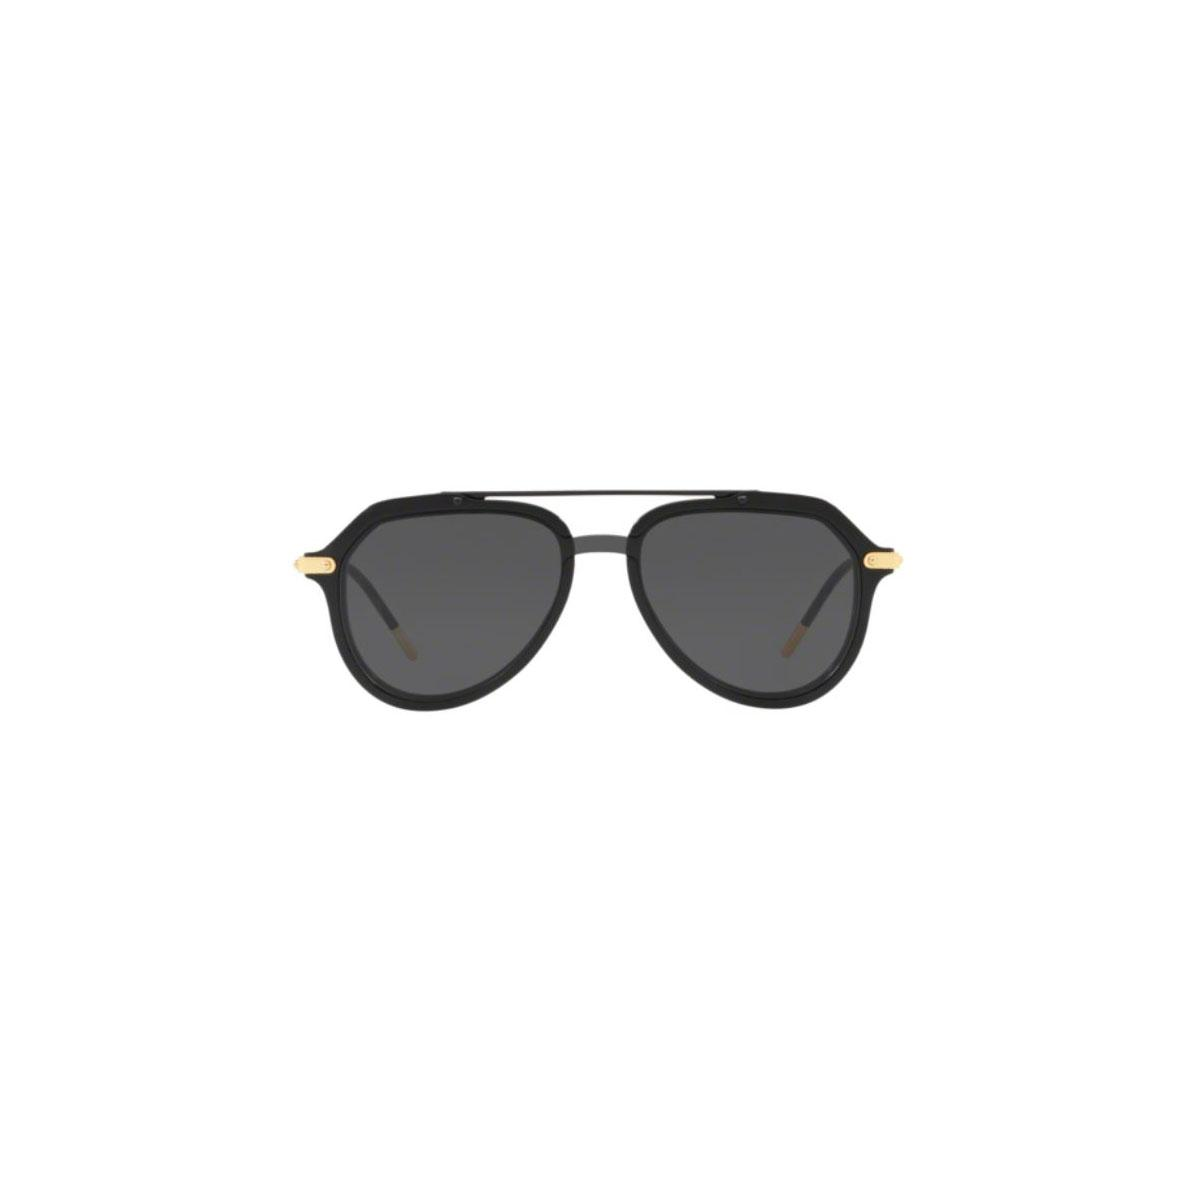 baa10d8584 Dolce   Gabbana Sunglasses Dg4330 501 87 22mm for Men - Lyst